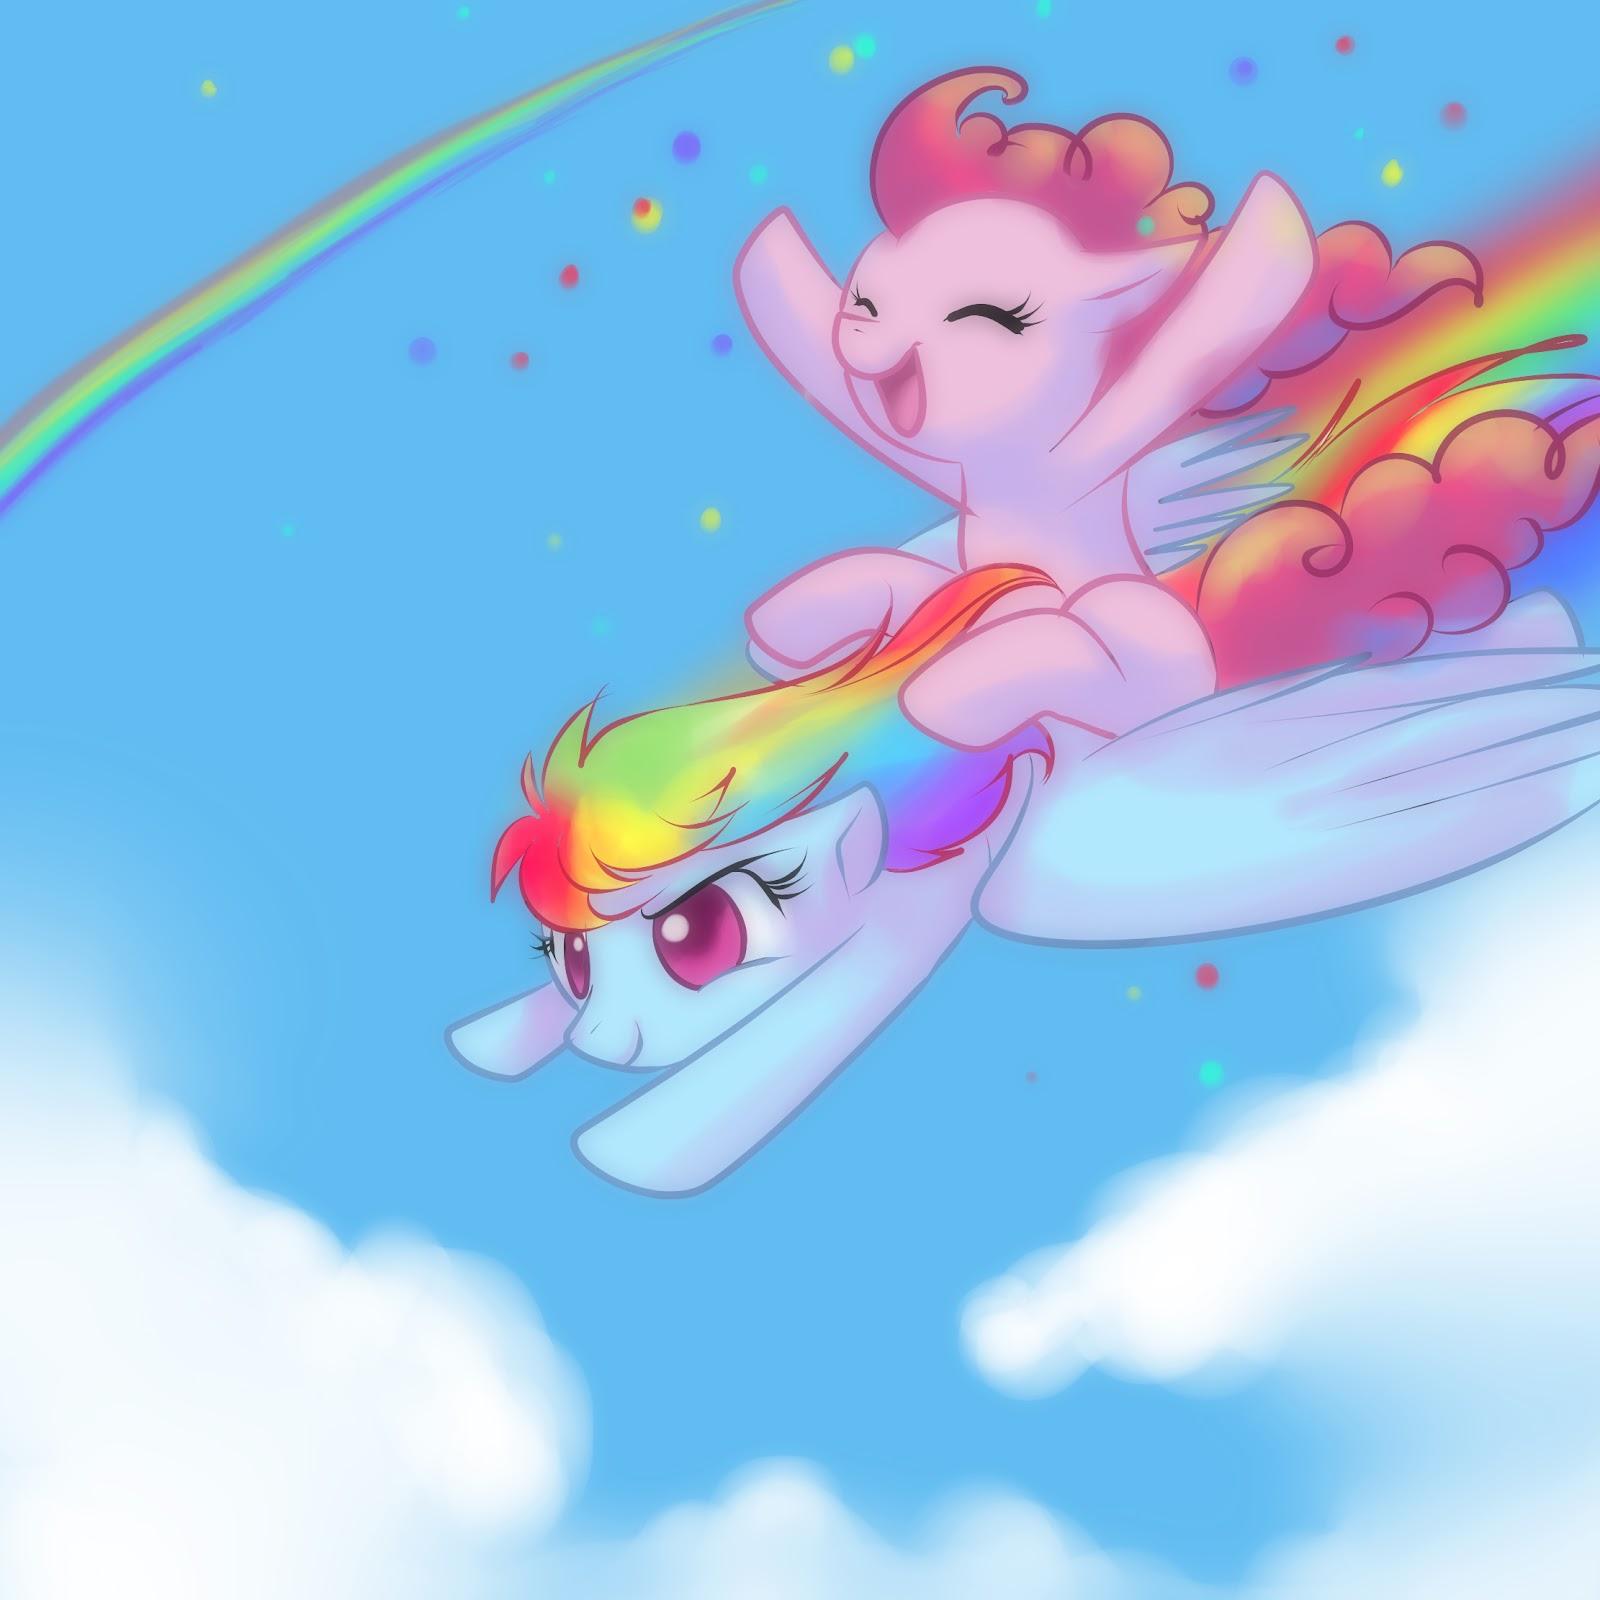 Flying-Through-The-Sky-my-little-pony-friendship-is-magic-31915475-1600-1600.jpg